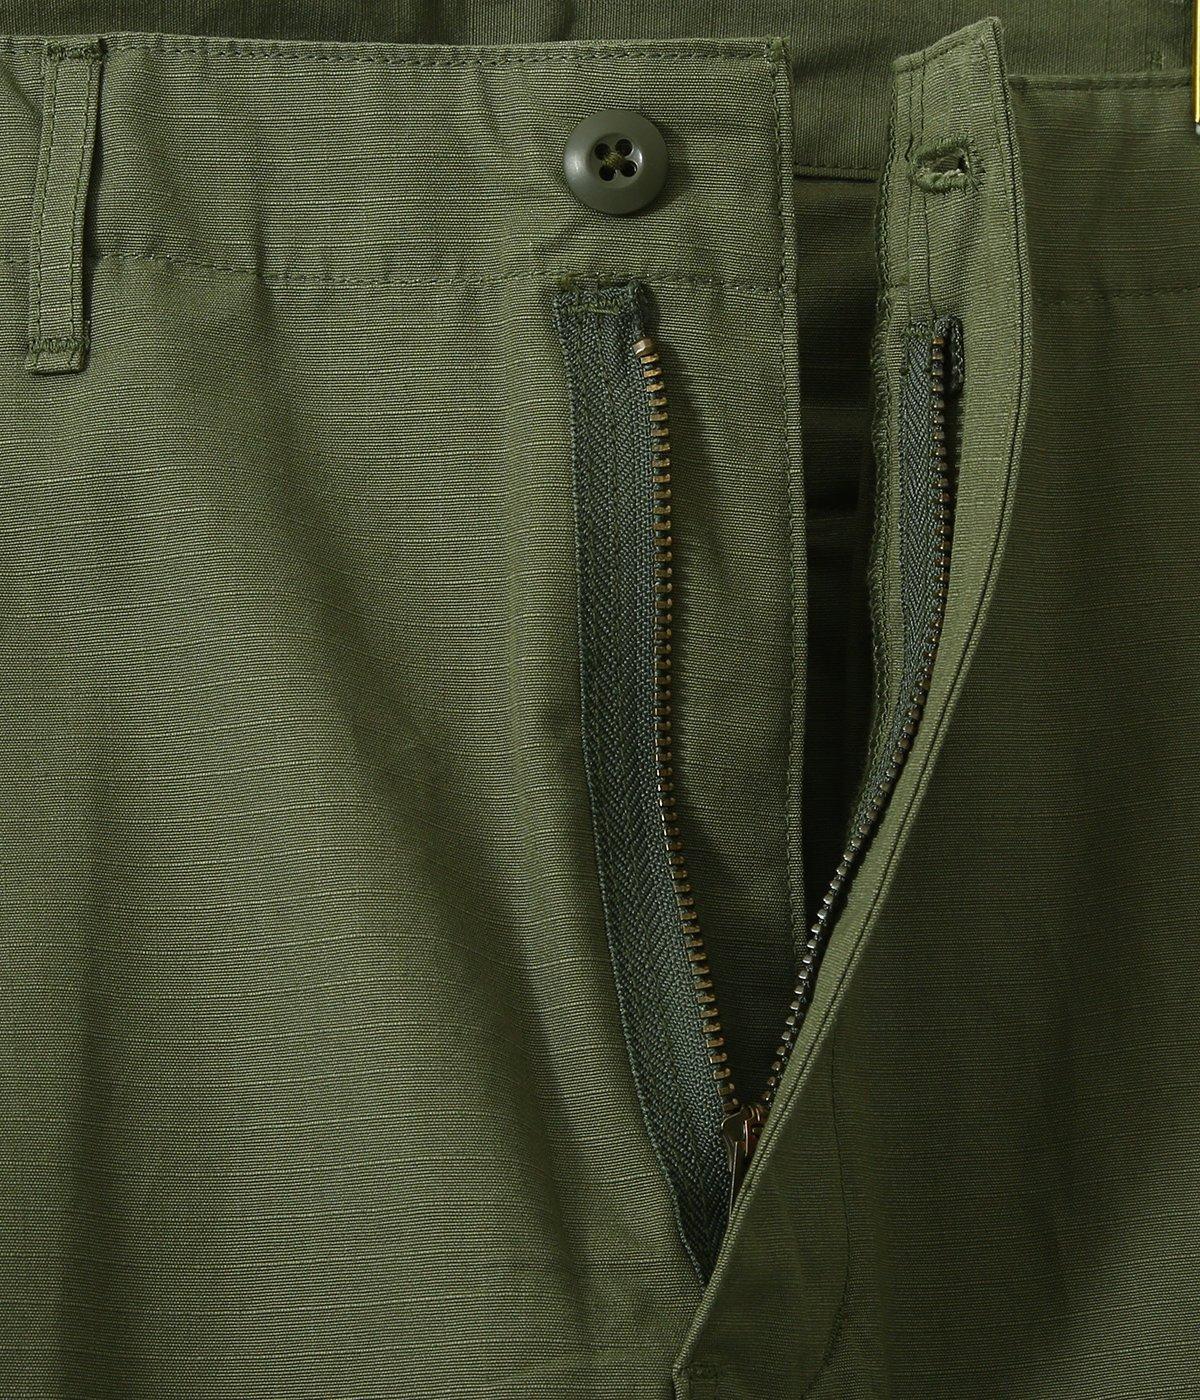 SLIM FIT 6P CARGO PANTS